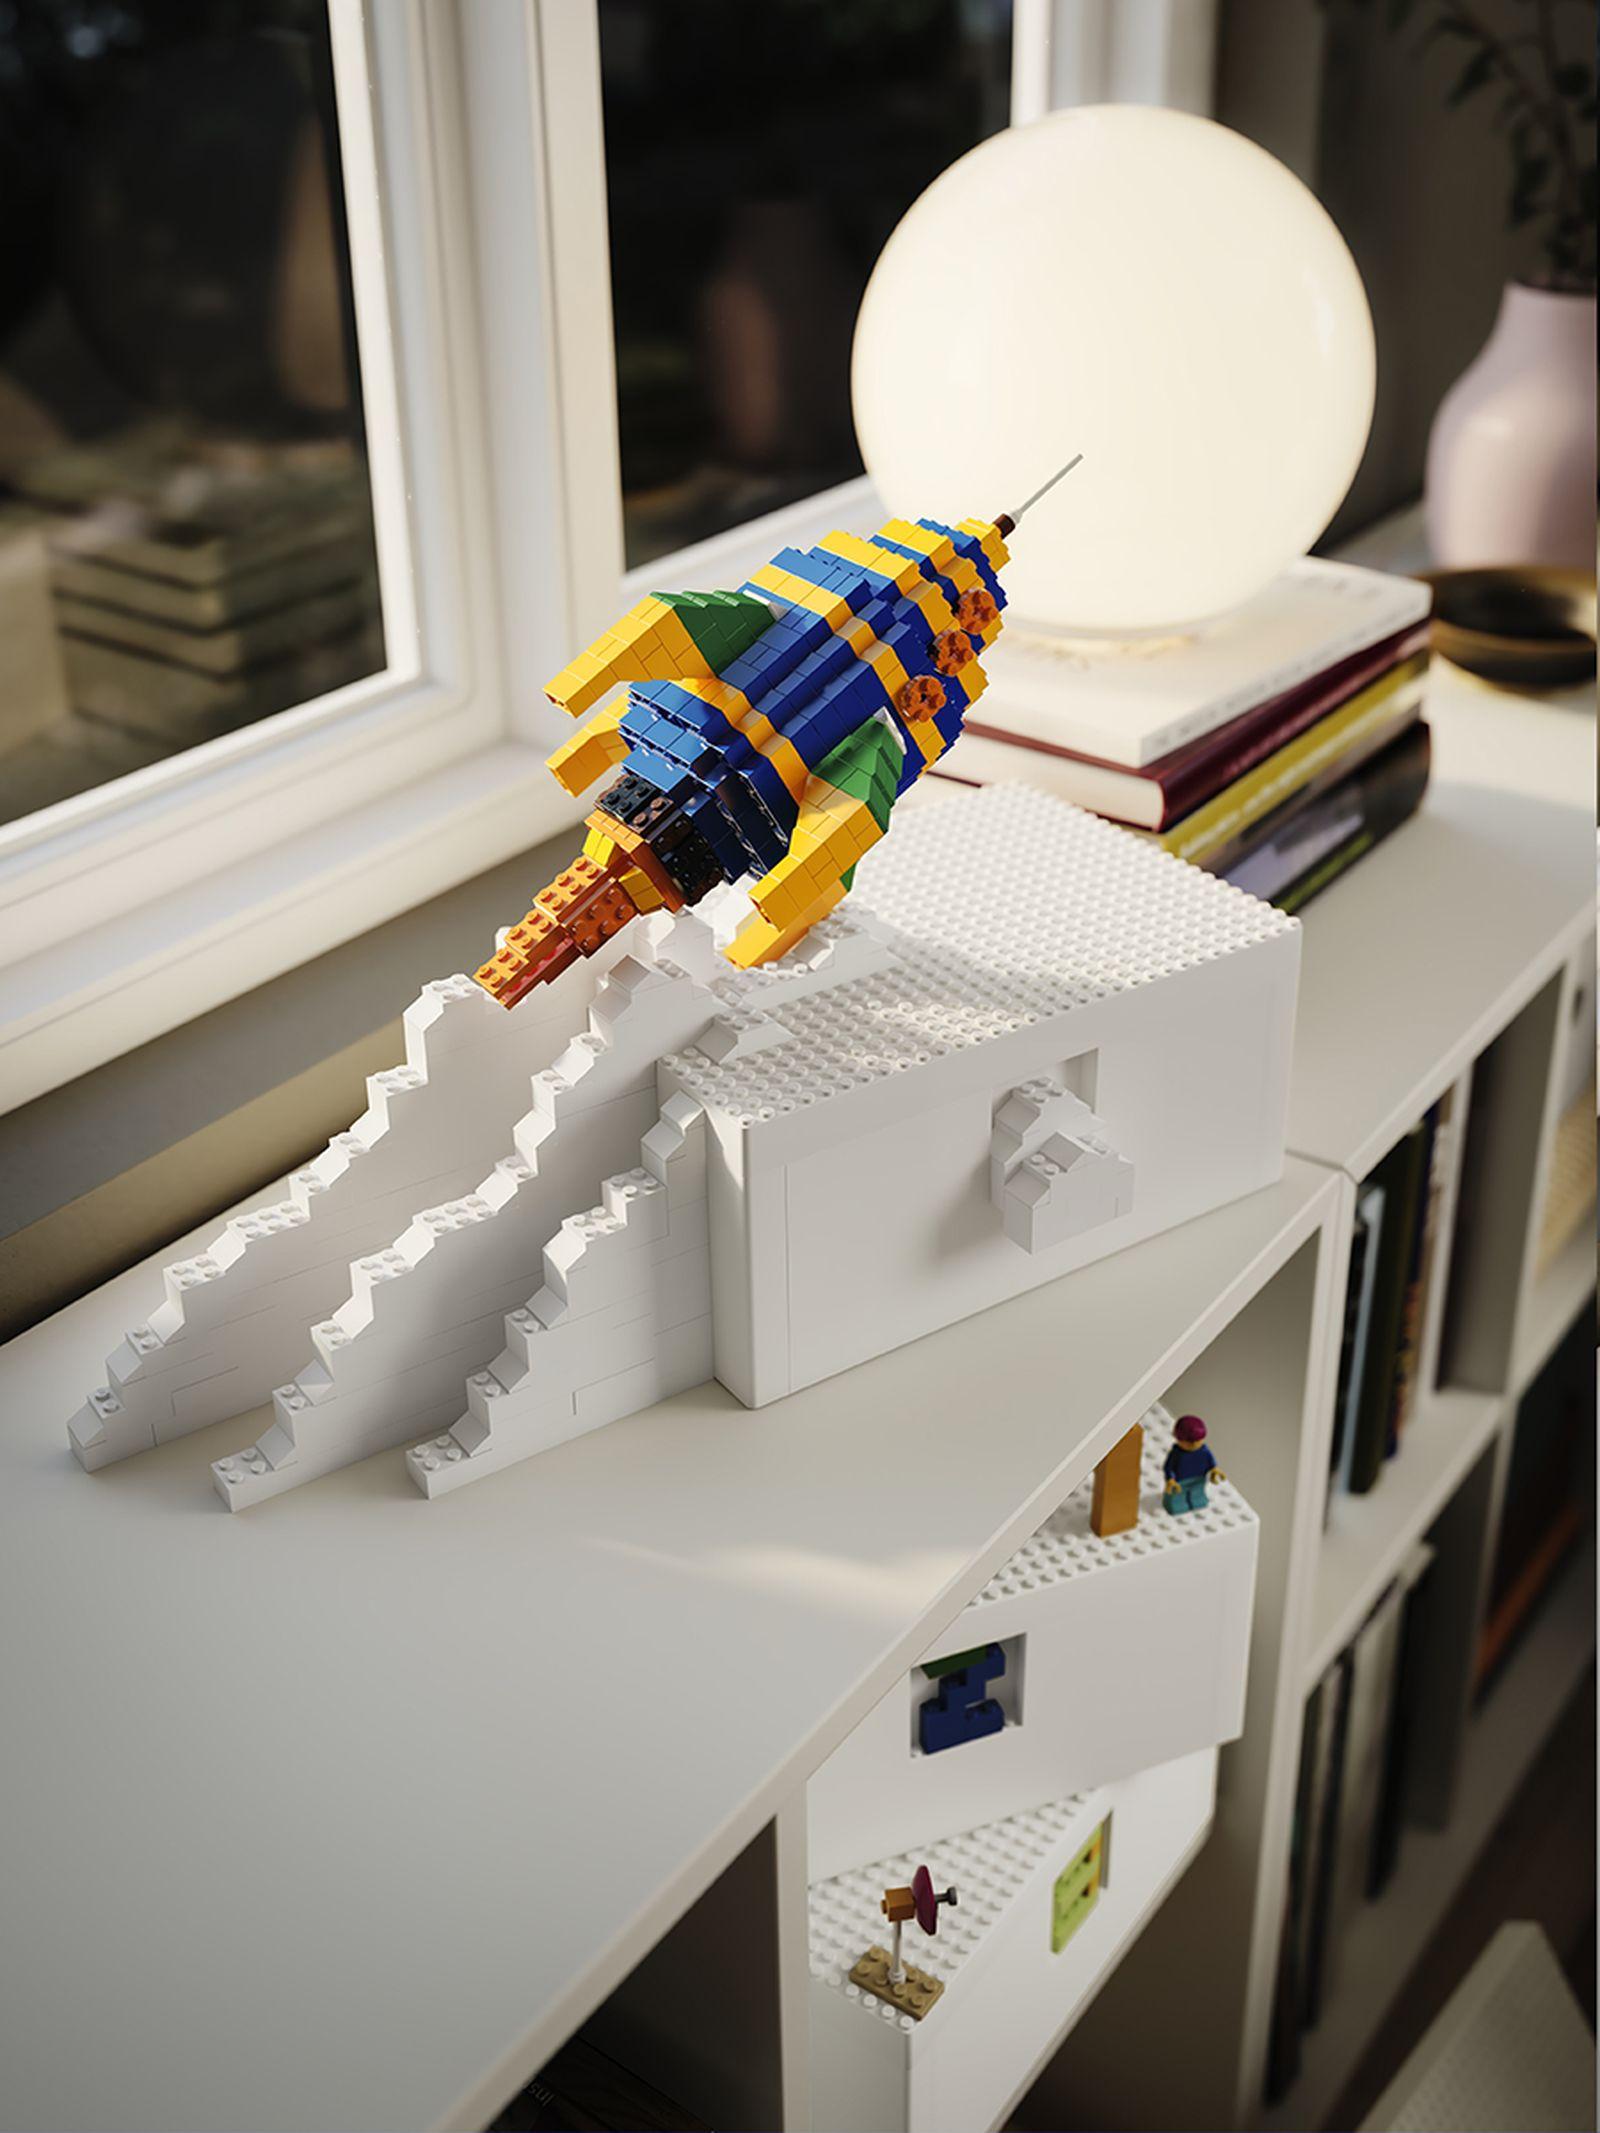 IKEA LEGO BYGGLEK collaboration